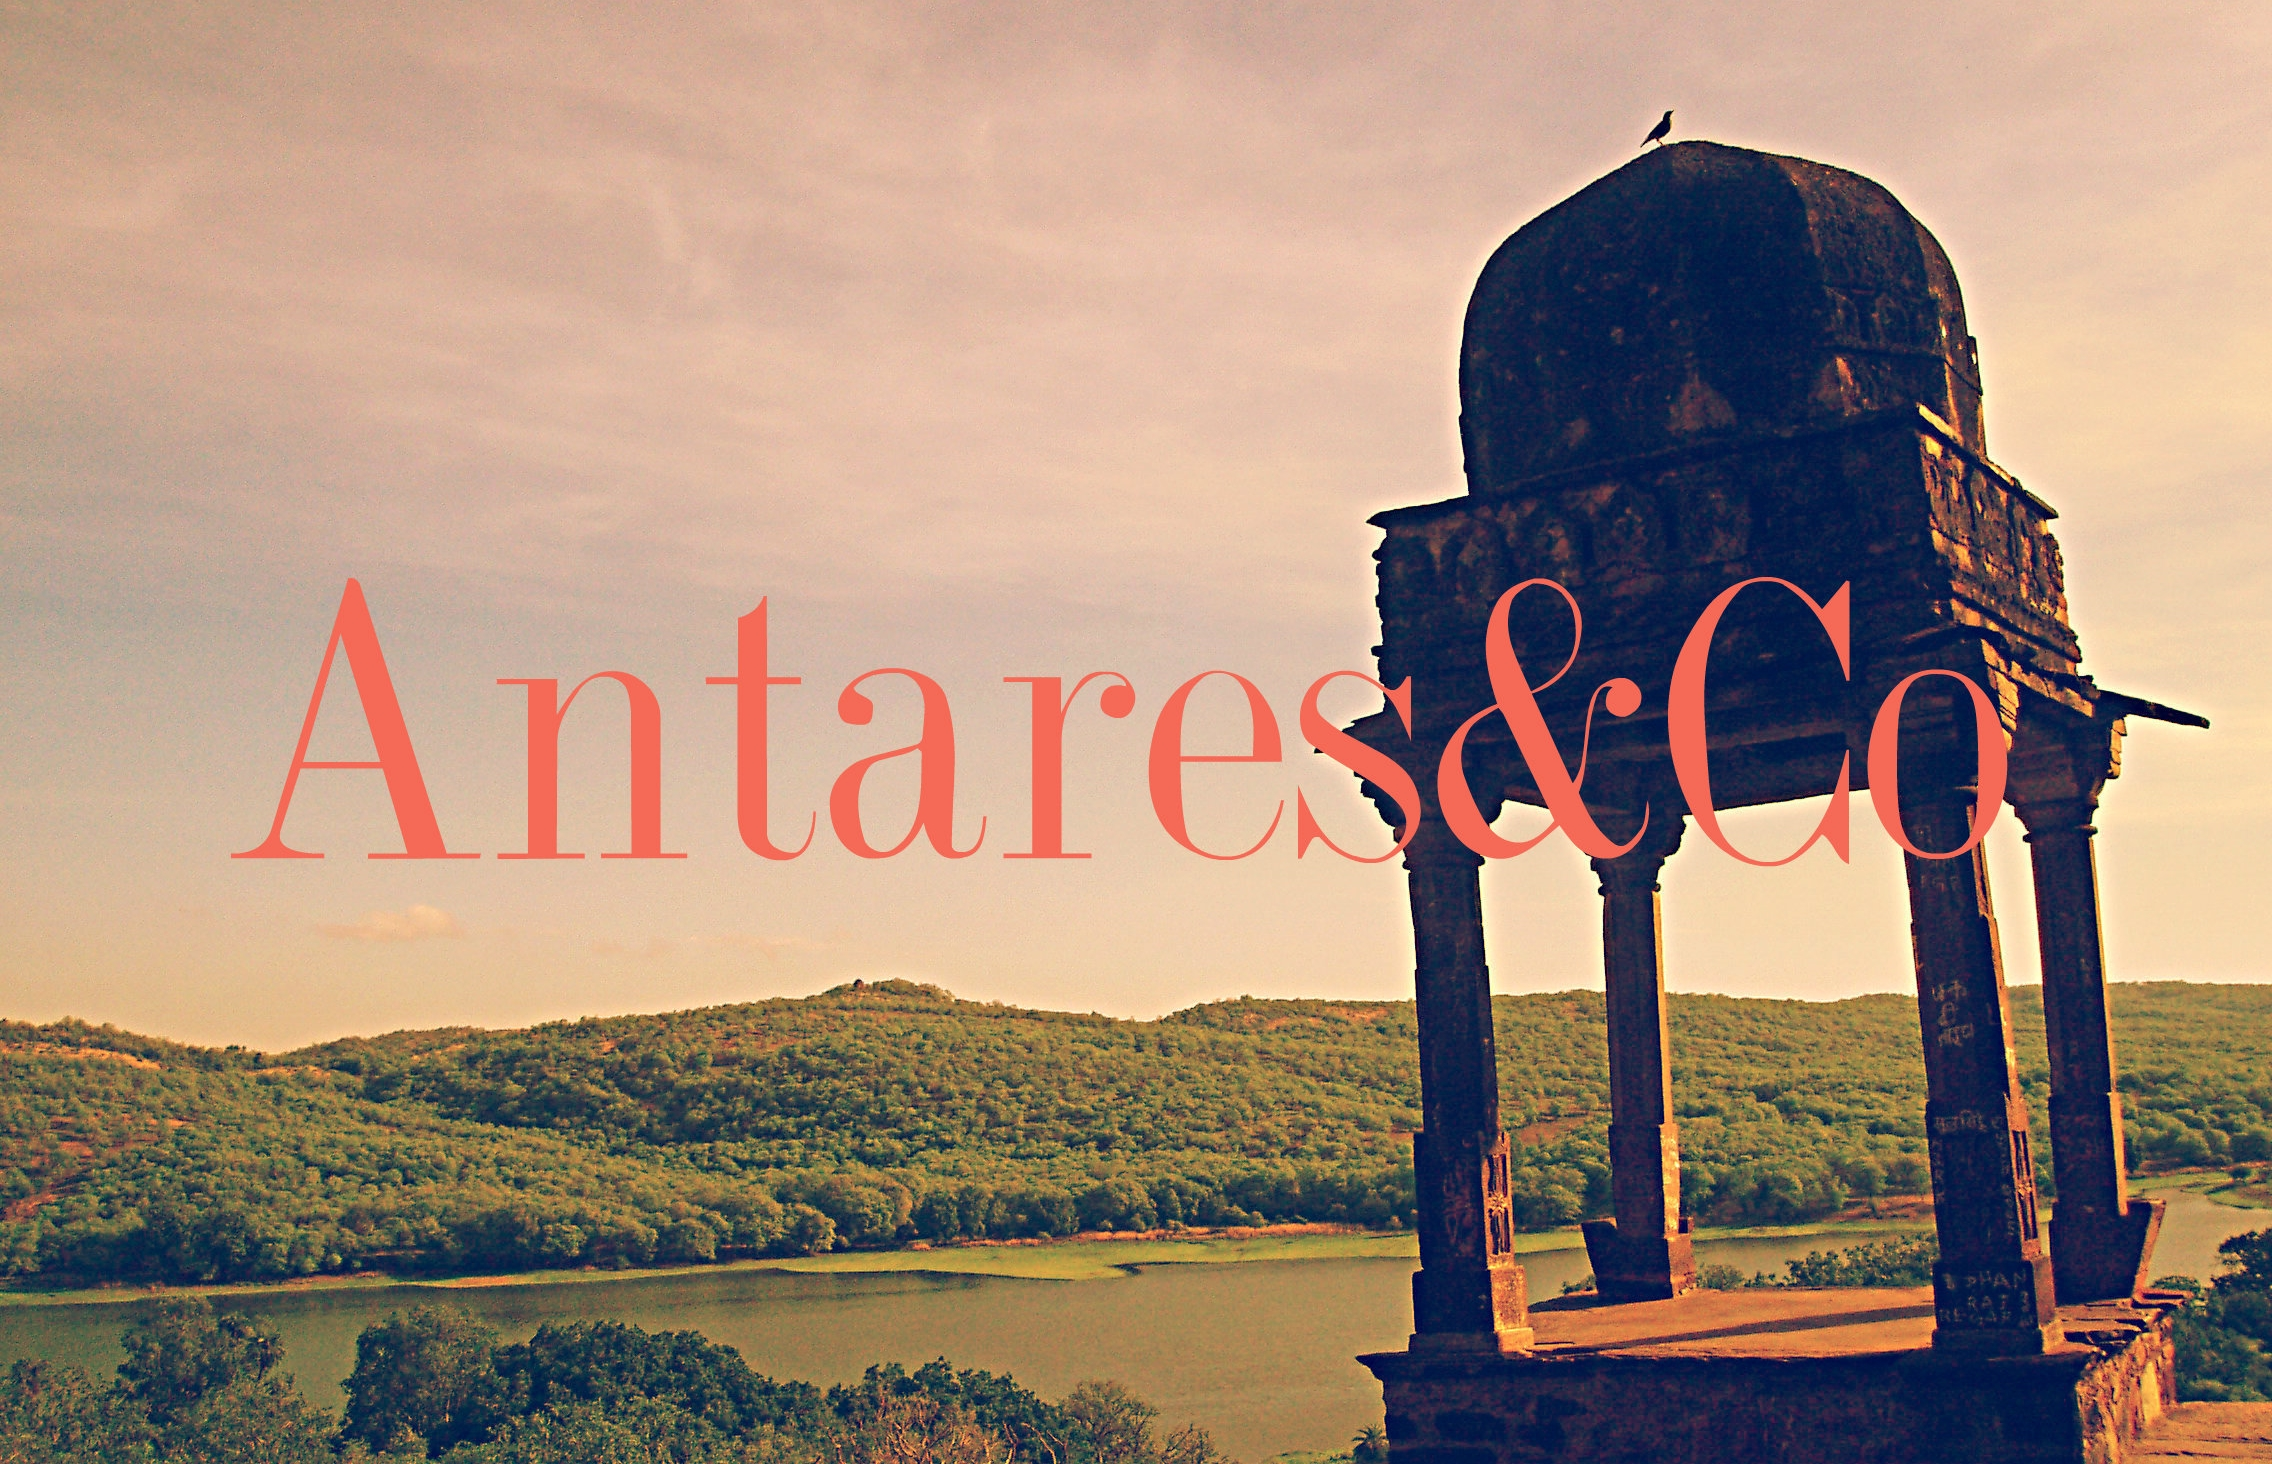 Antaresandco.jpg